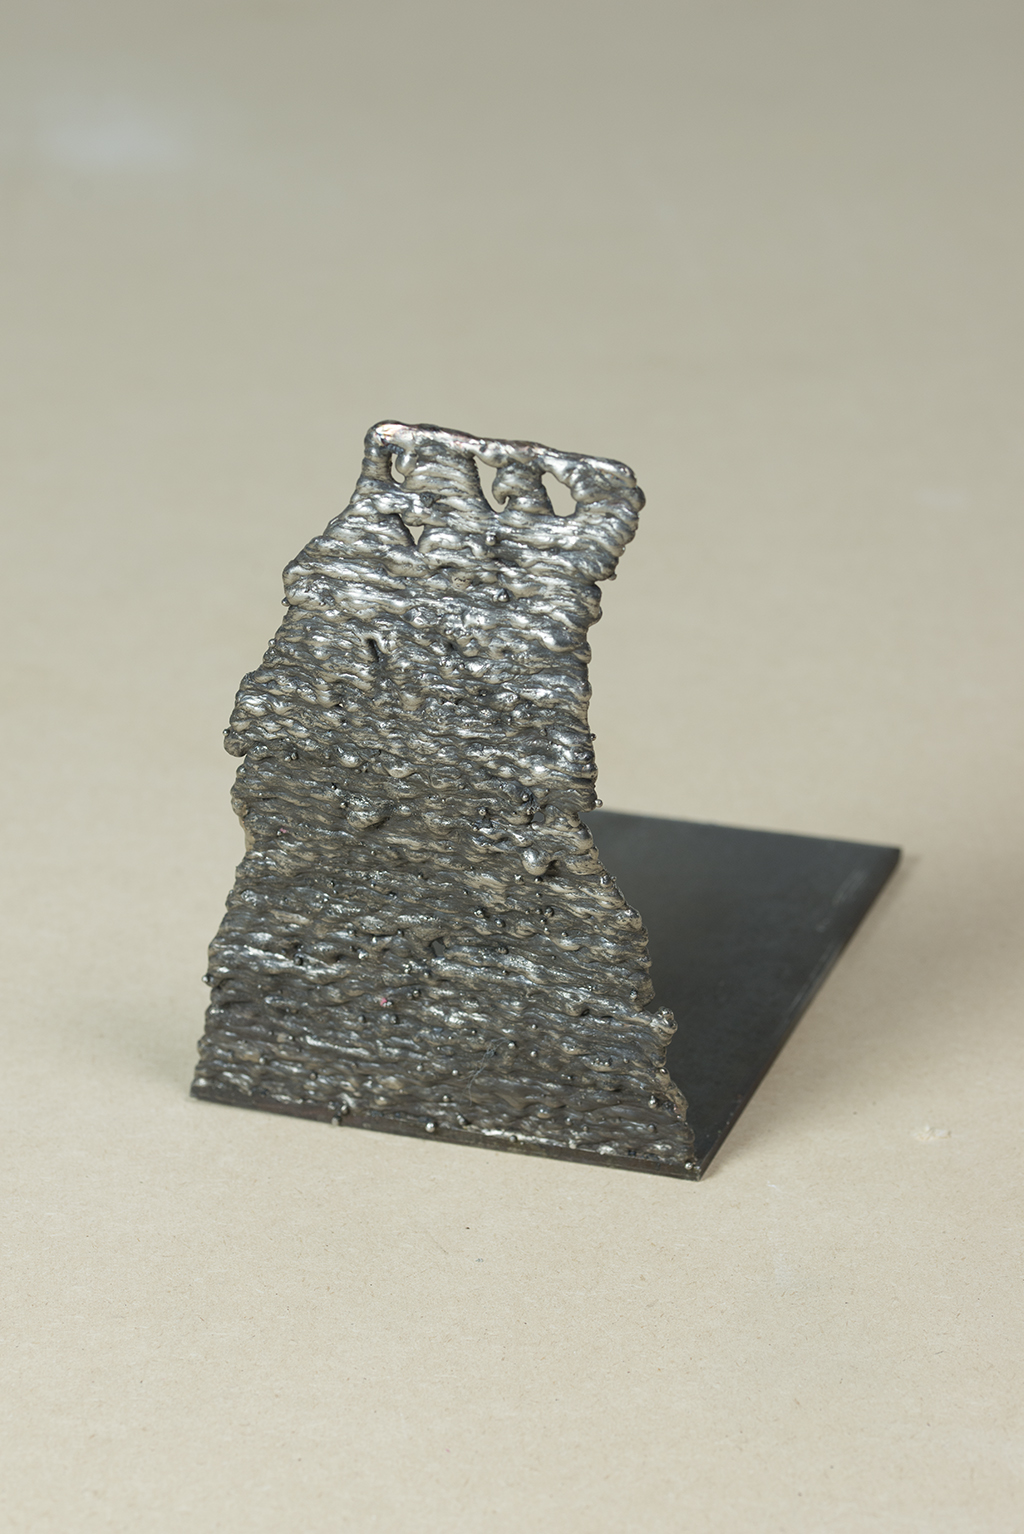 Mild steel, stainless steel weld. 23cm x 23cm x 15.5cm